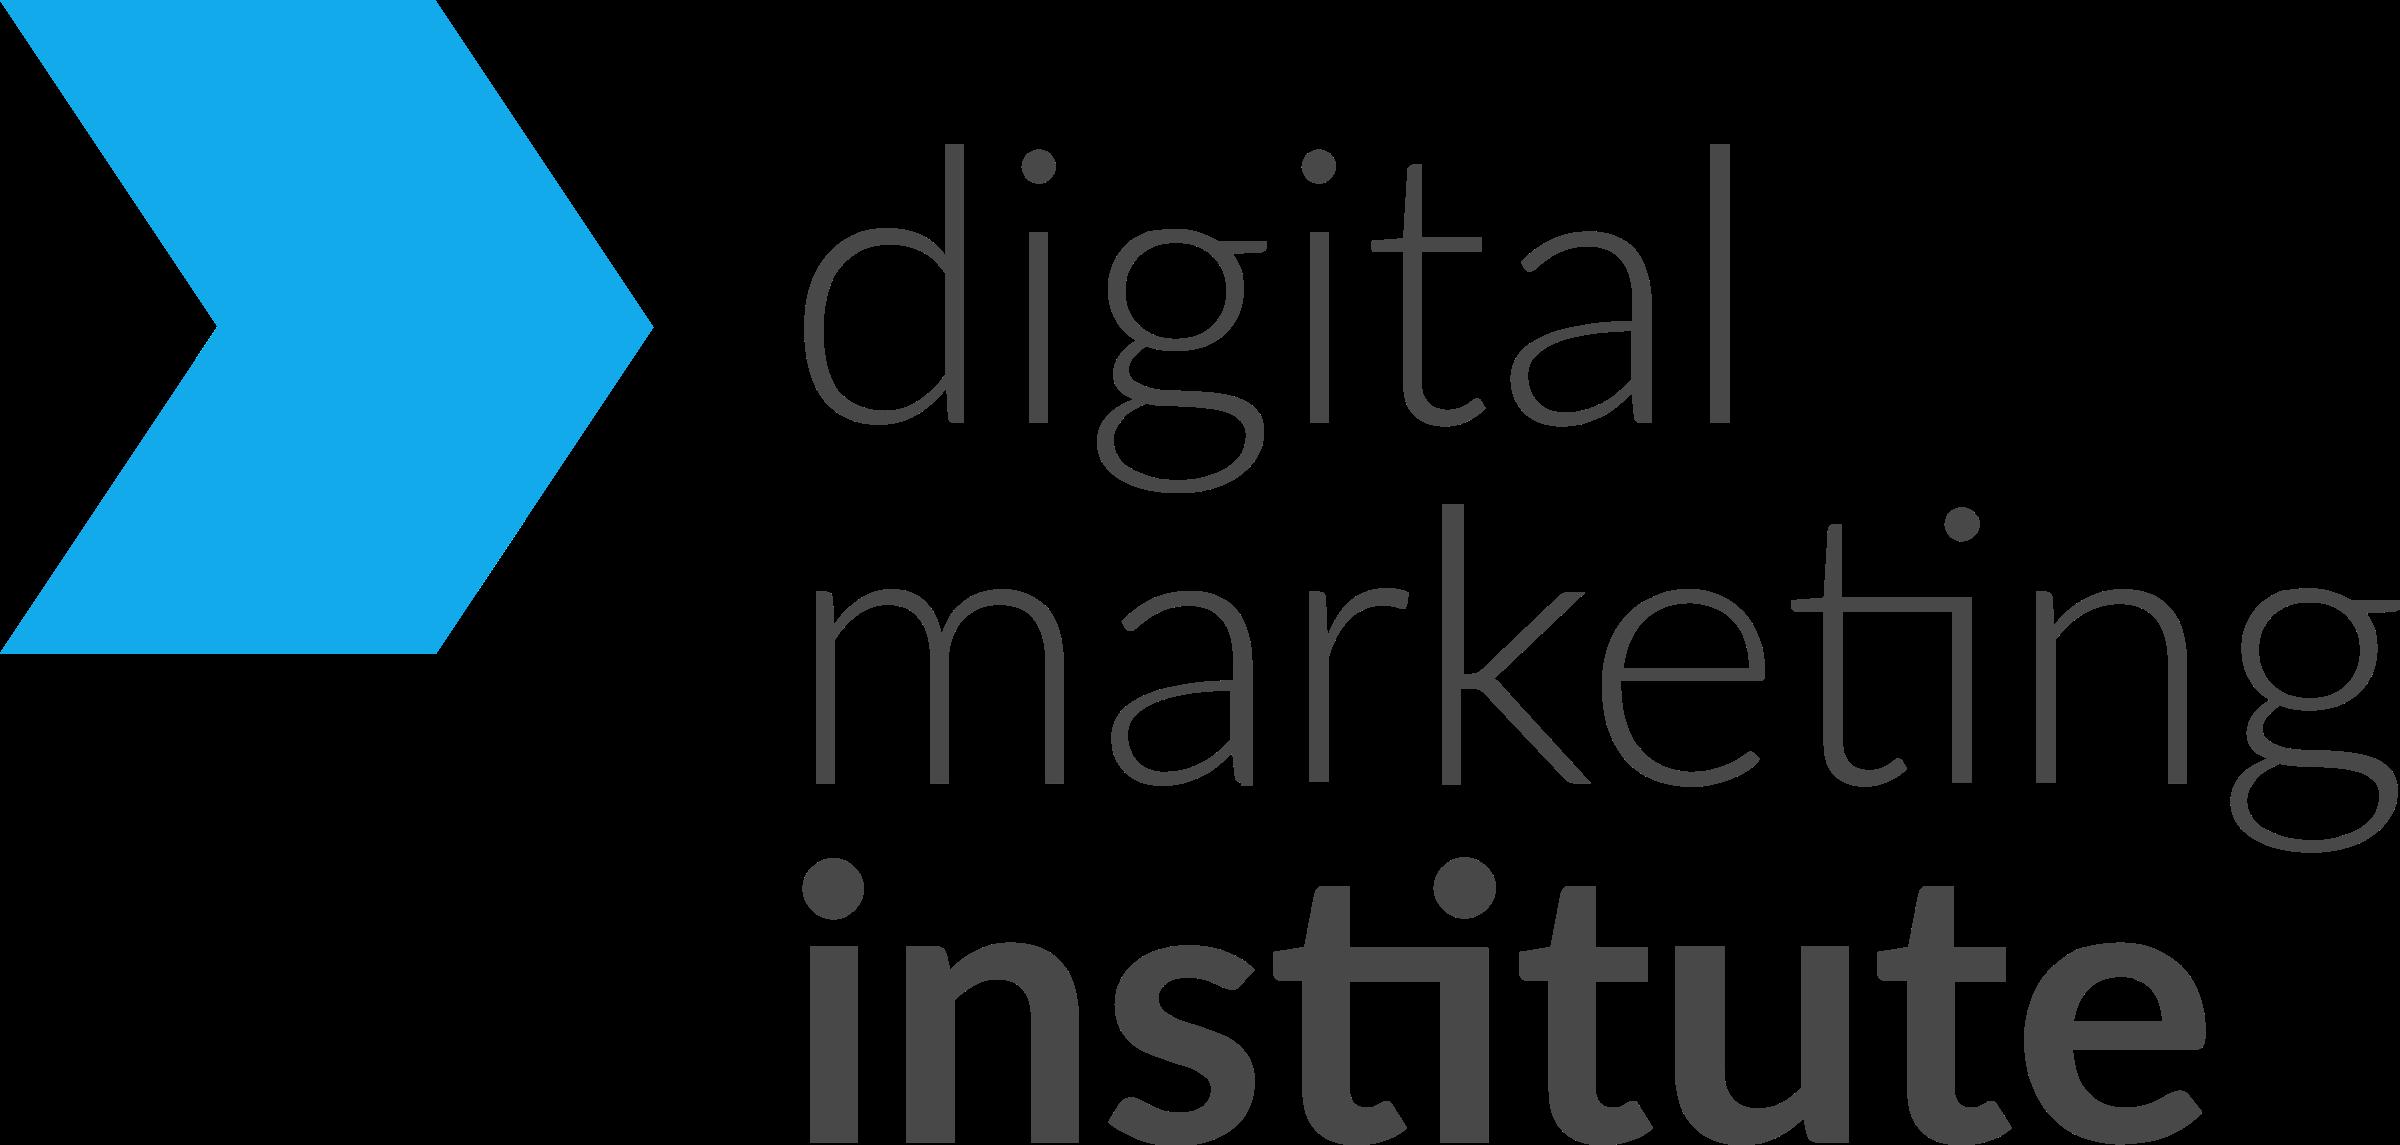 digital marketing logo png 19 free Cliparts | Download ...